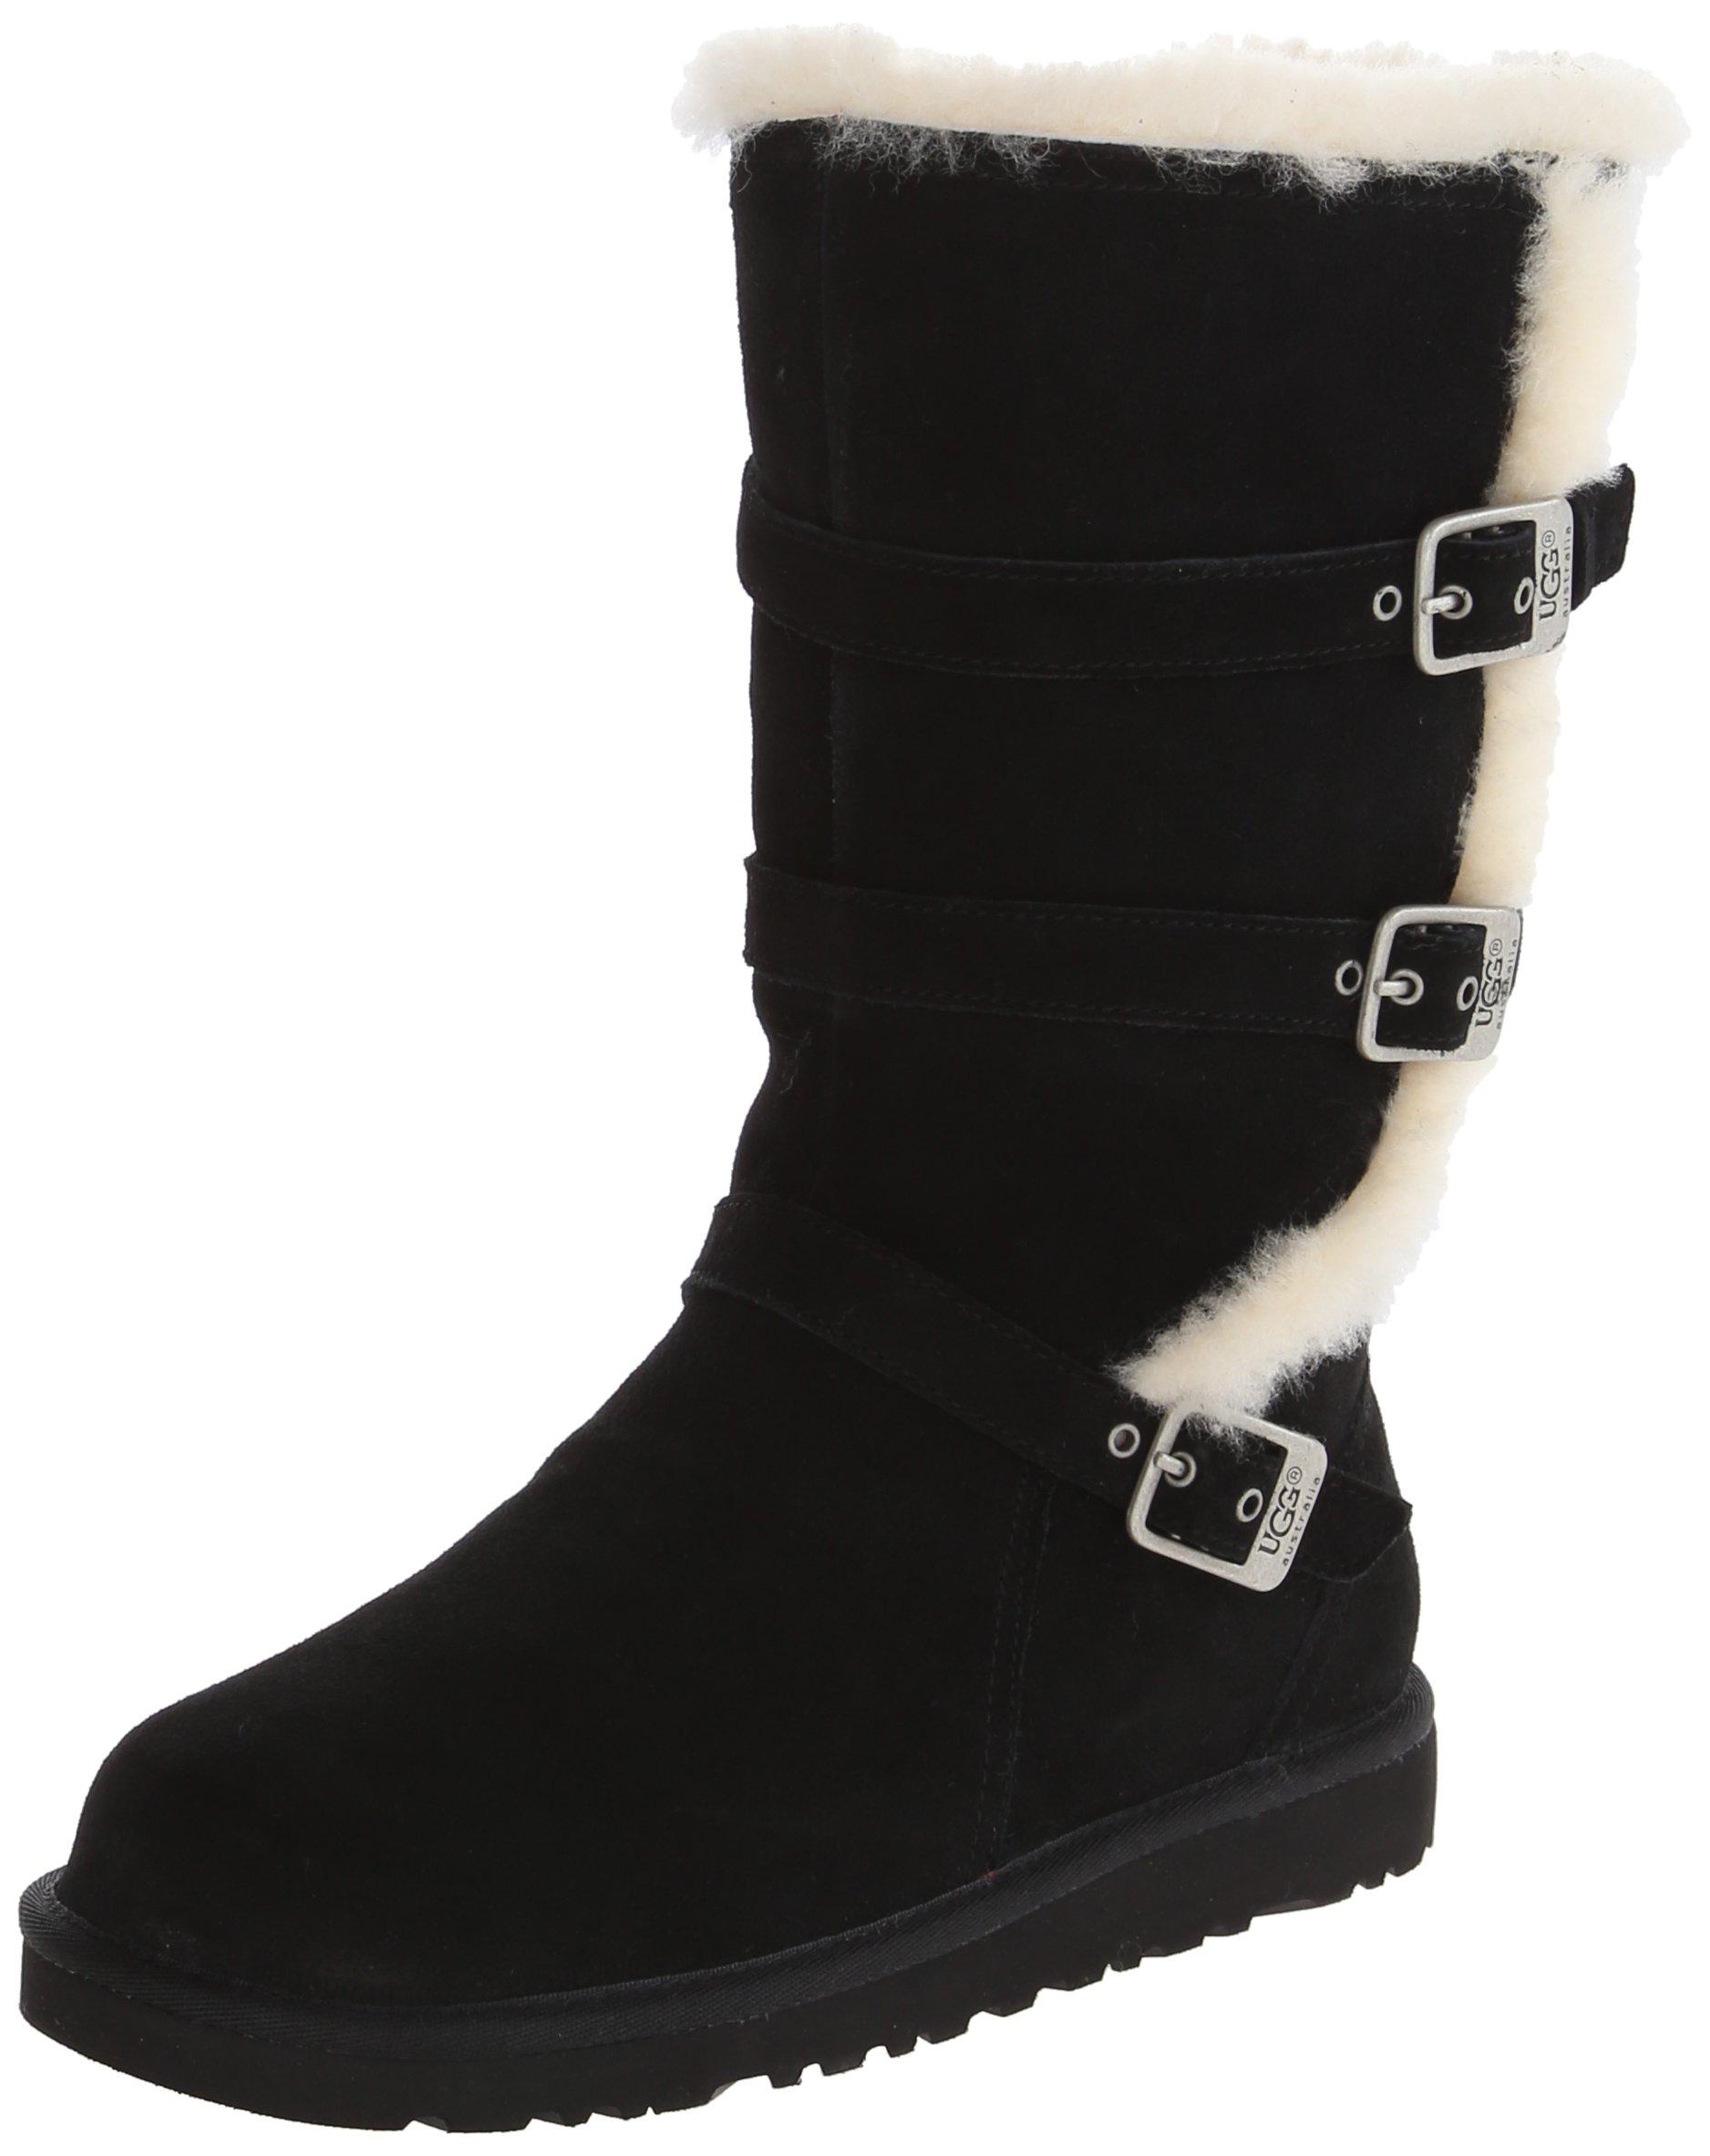 UGG Australia Girls Maddi Black Winter Boot - 6 by UGG